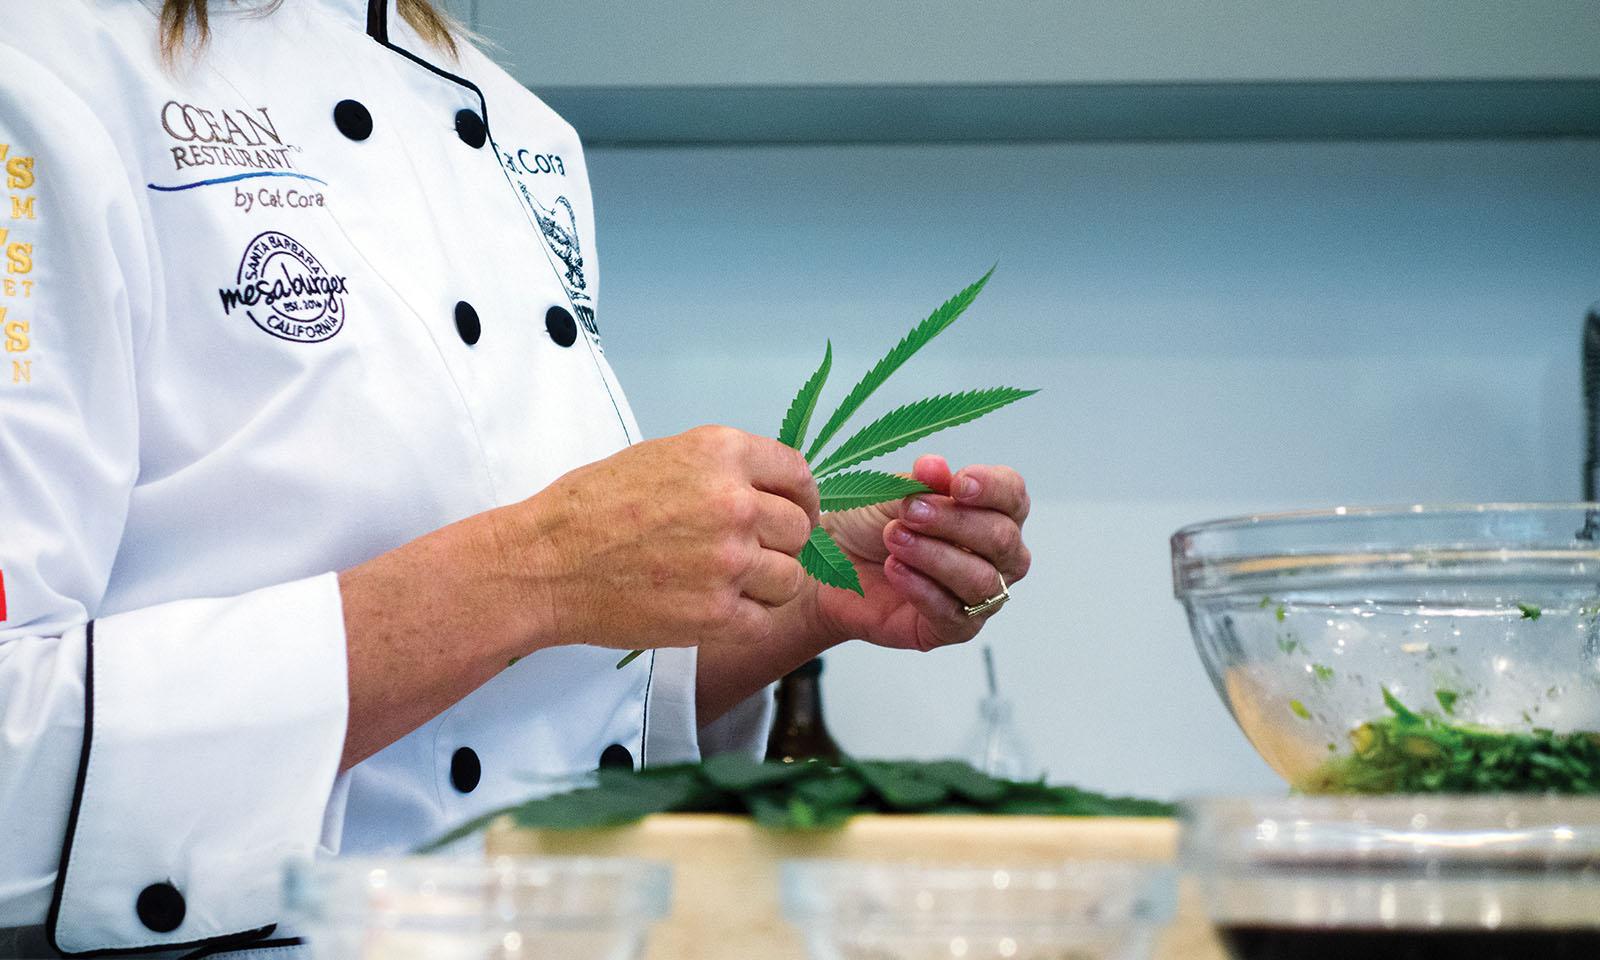 Cat Cora marijuana leaf Cannabis Now